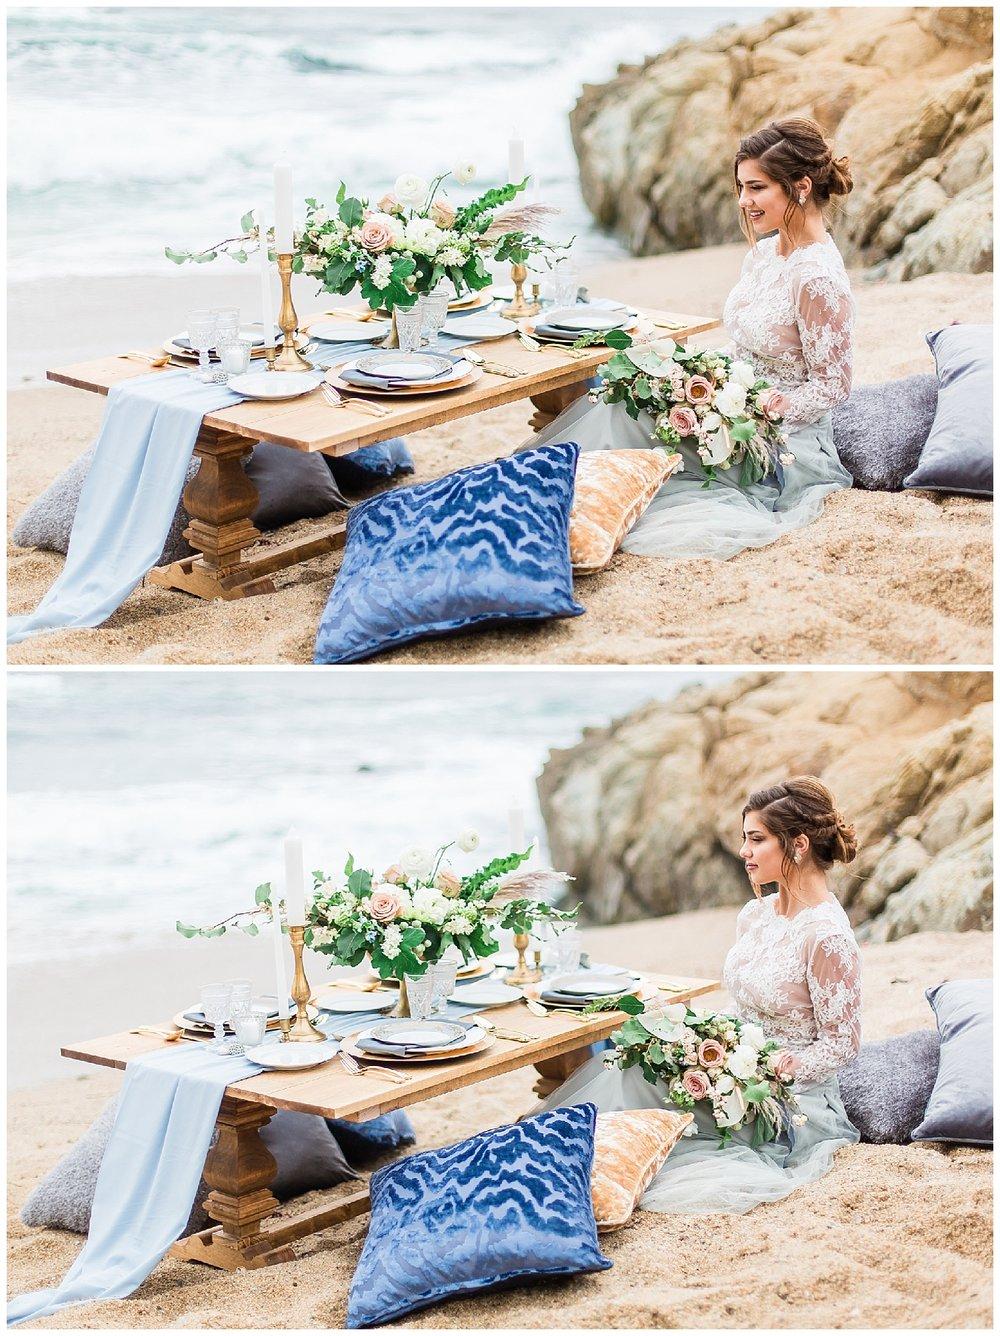 big-sur-ocean-wedding-beach-ideas.jpg